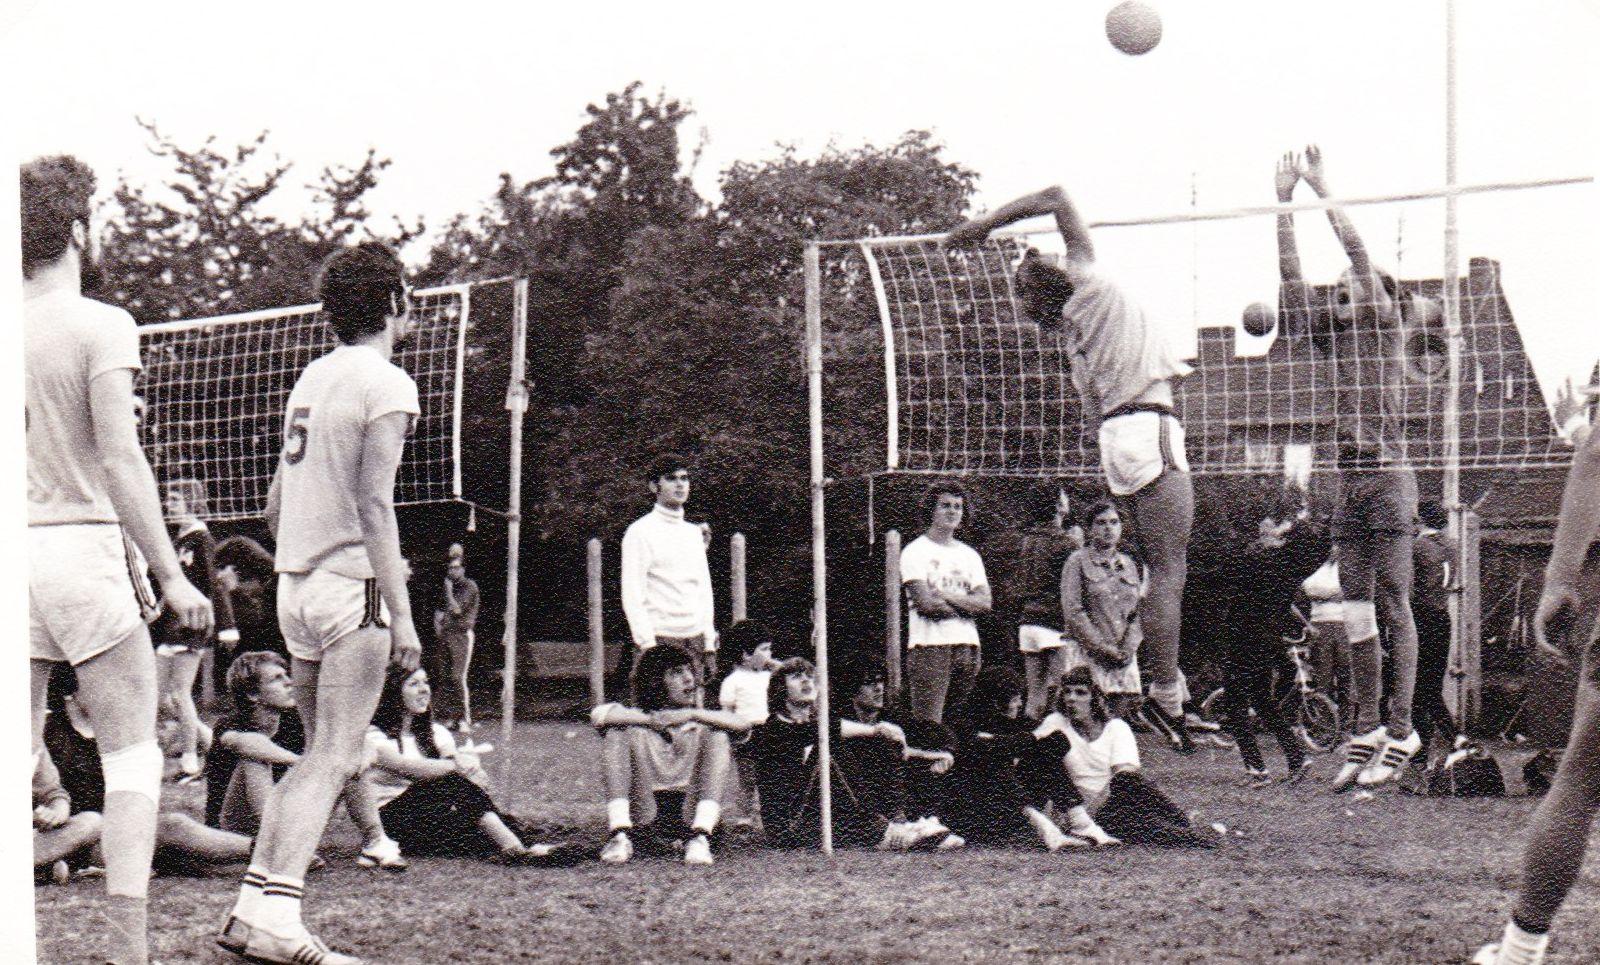 Buitentoernooi SDO Nieuwenhagen 1971 03.jpg